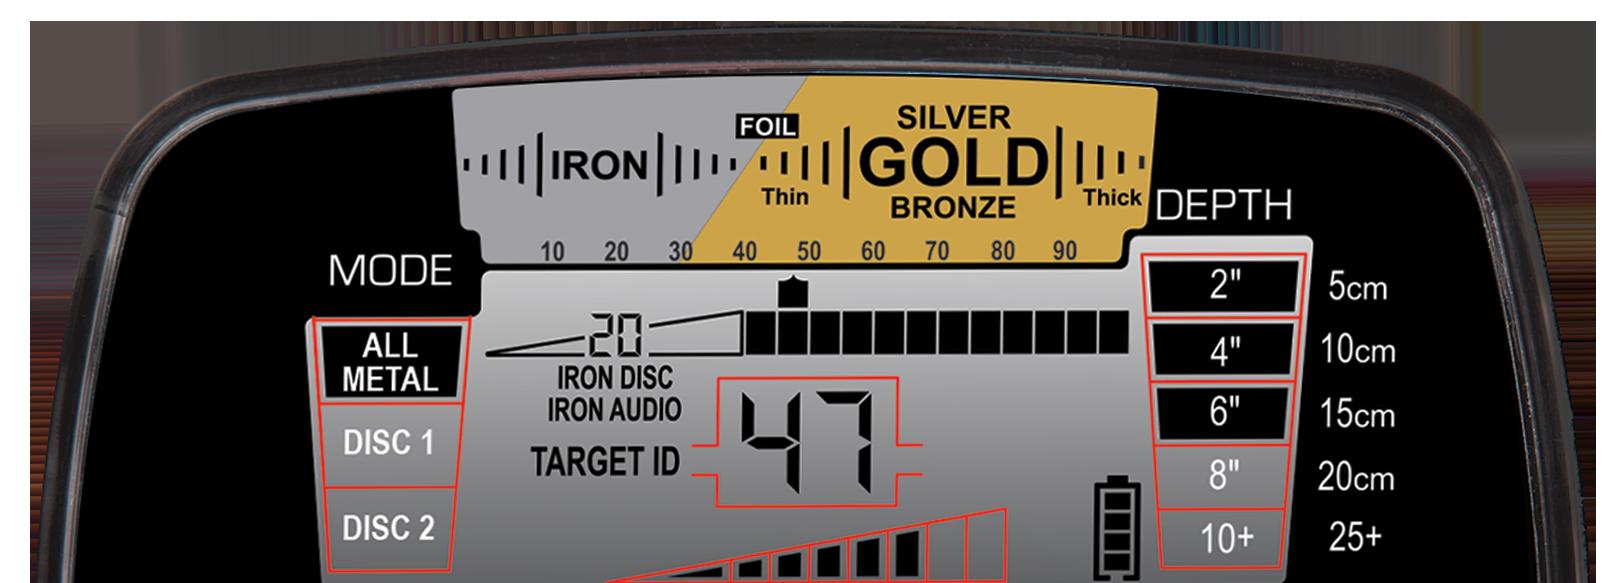 at-gold-display-obenNqsZ73kcAxbT4